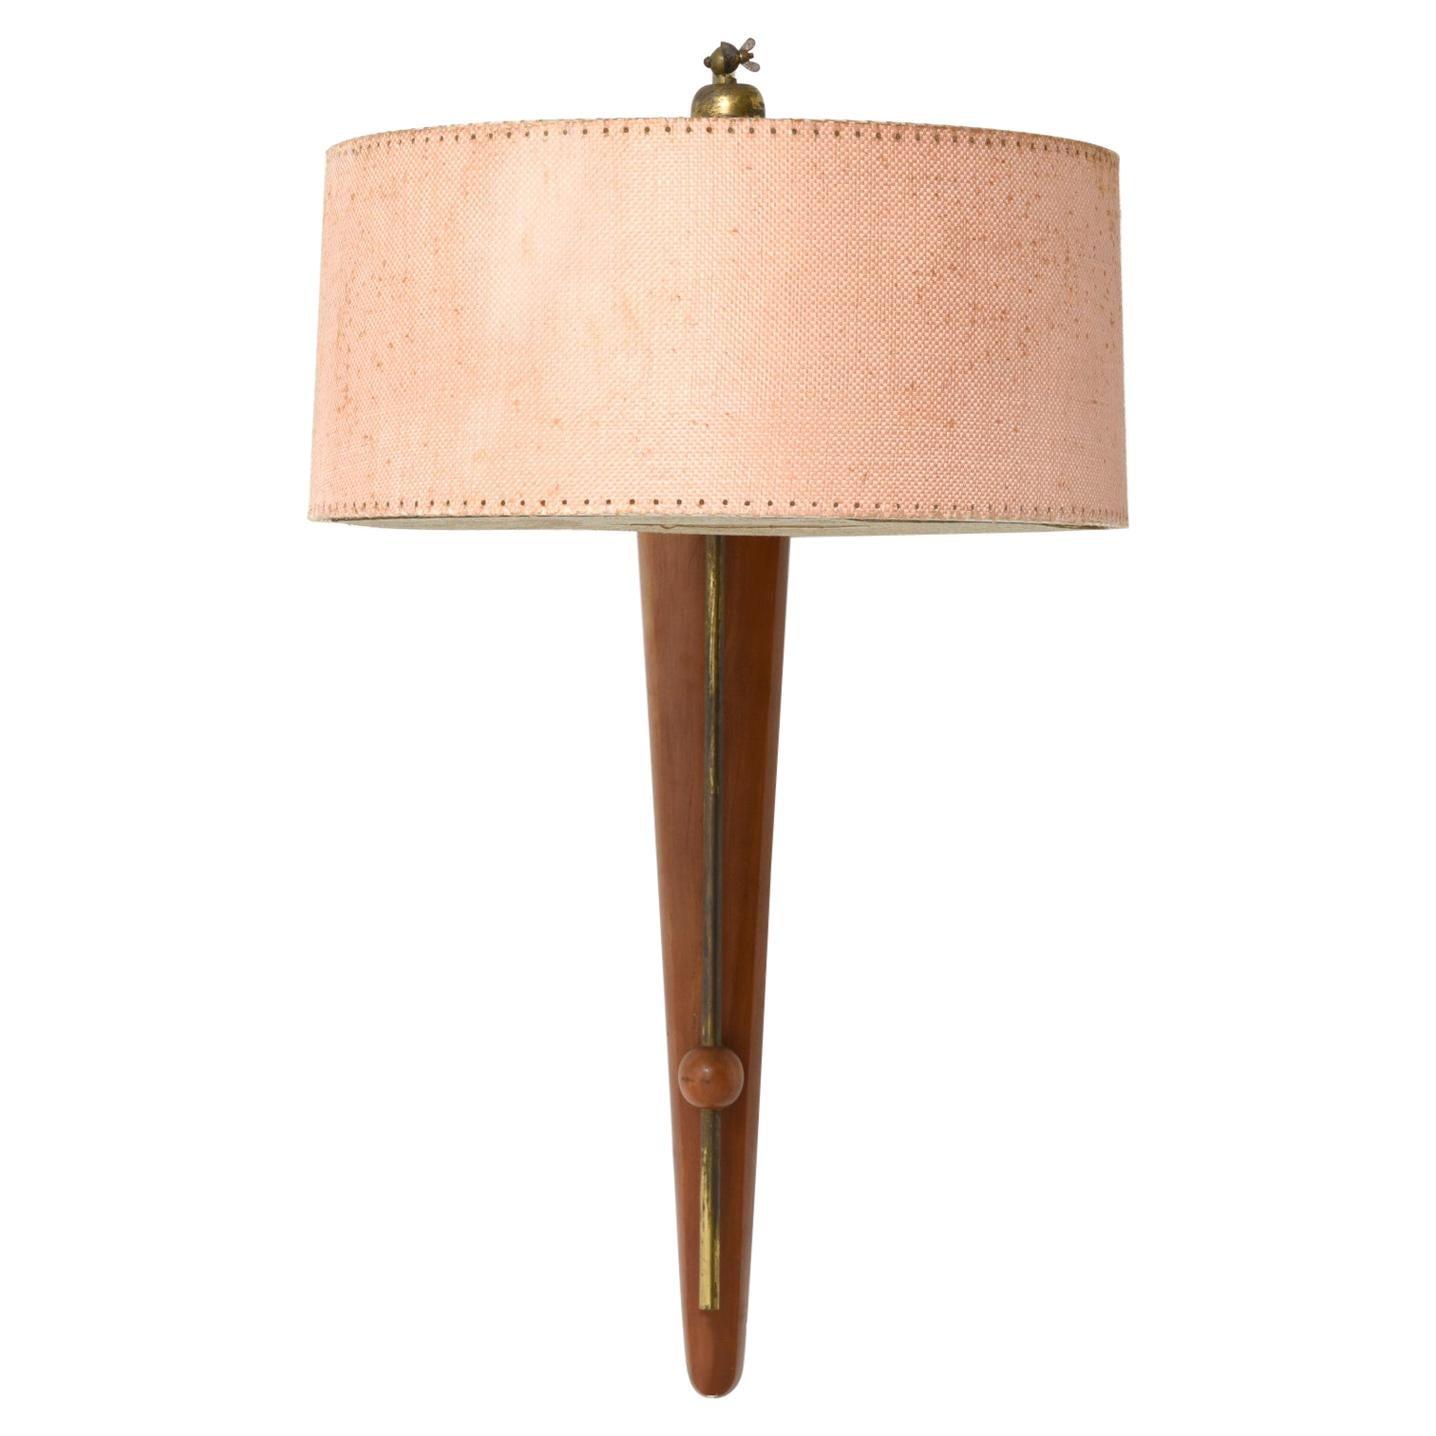 Mid-Century Danish Adjustable Teak and Brass Wall Lamp, 1958